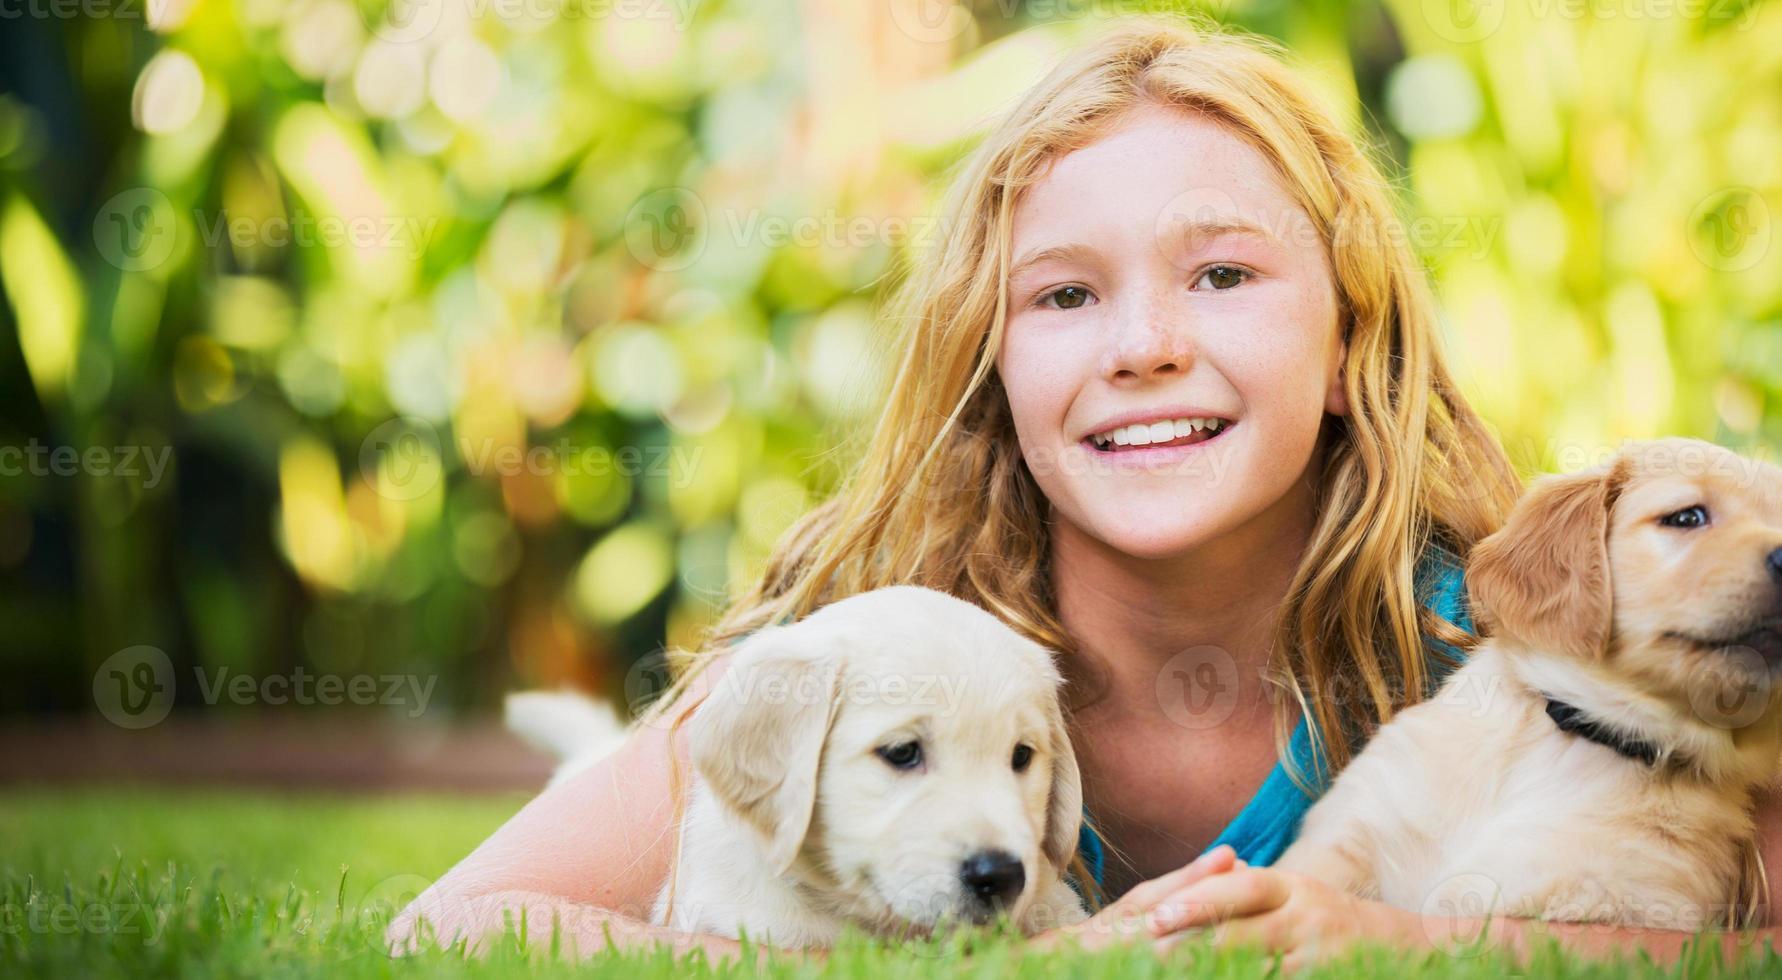 süßes junges Mädchen mit Welpen foto